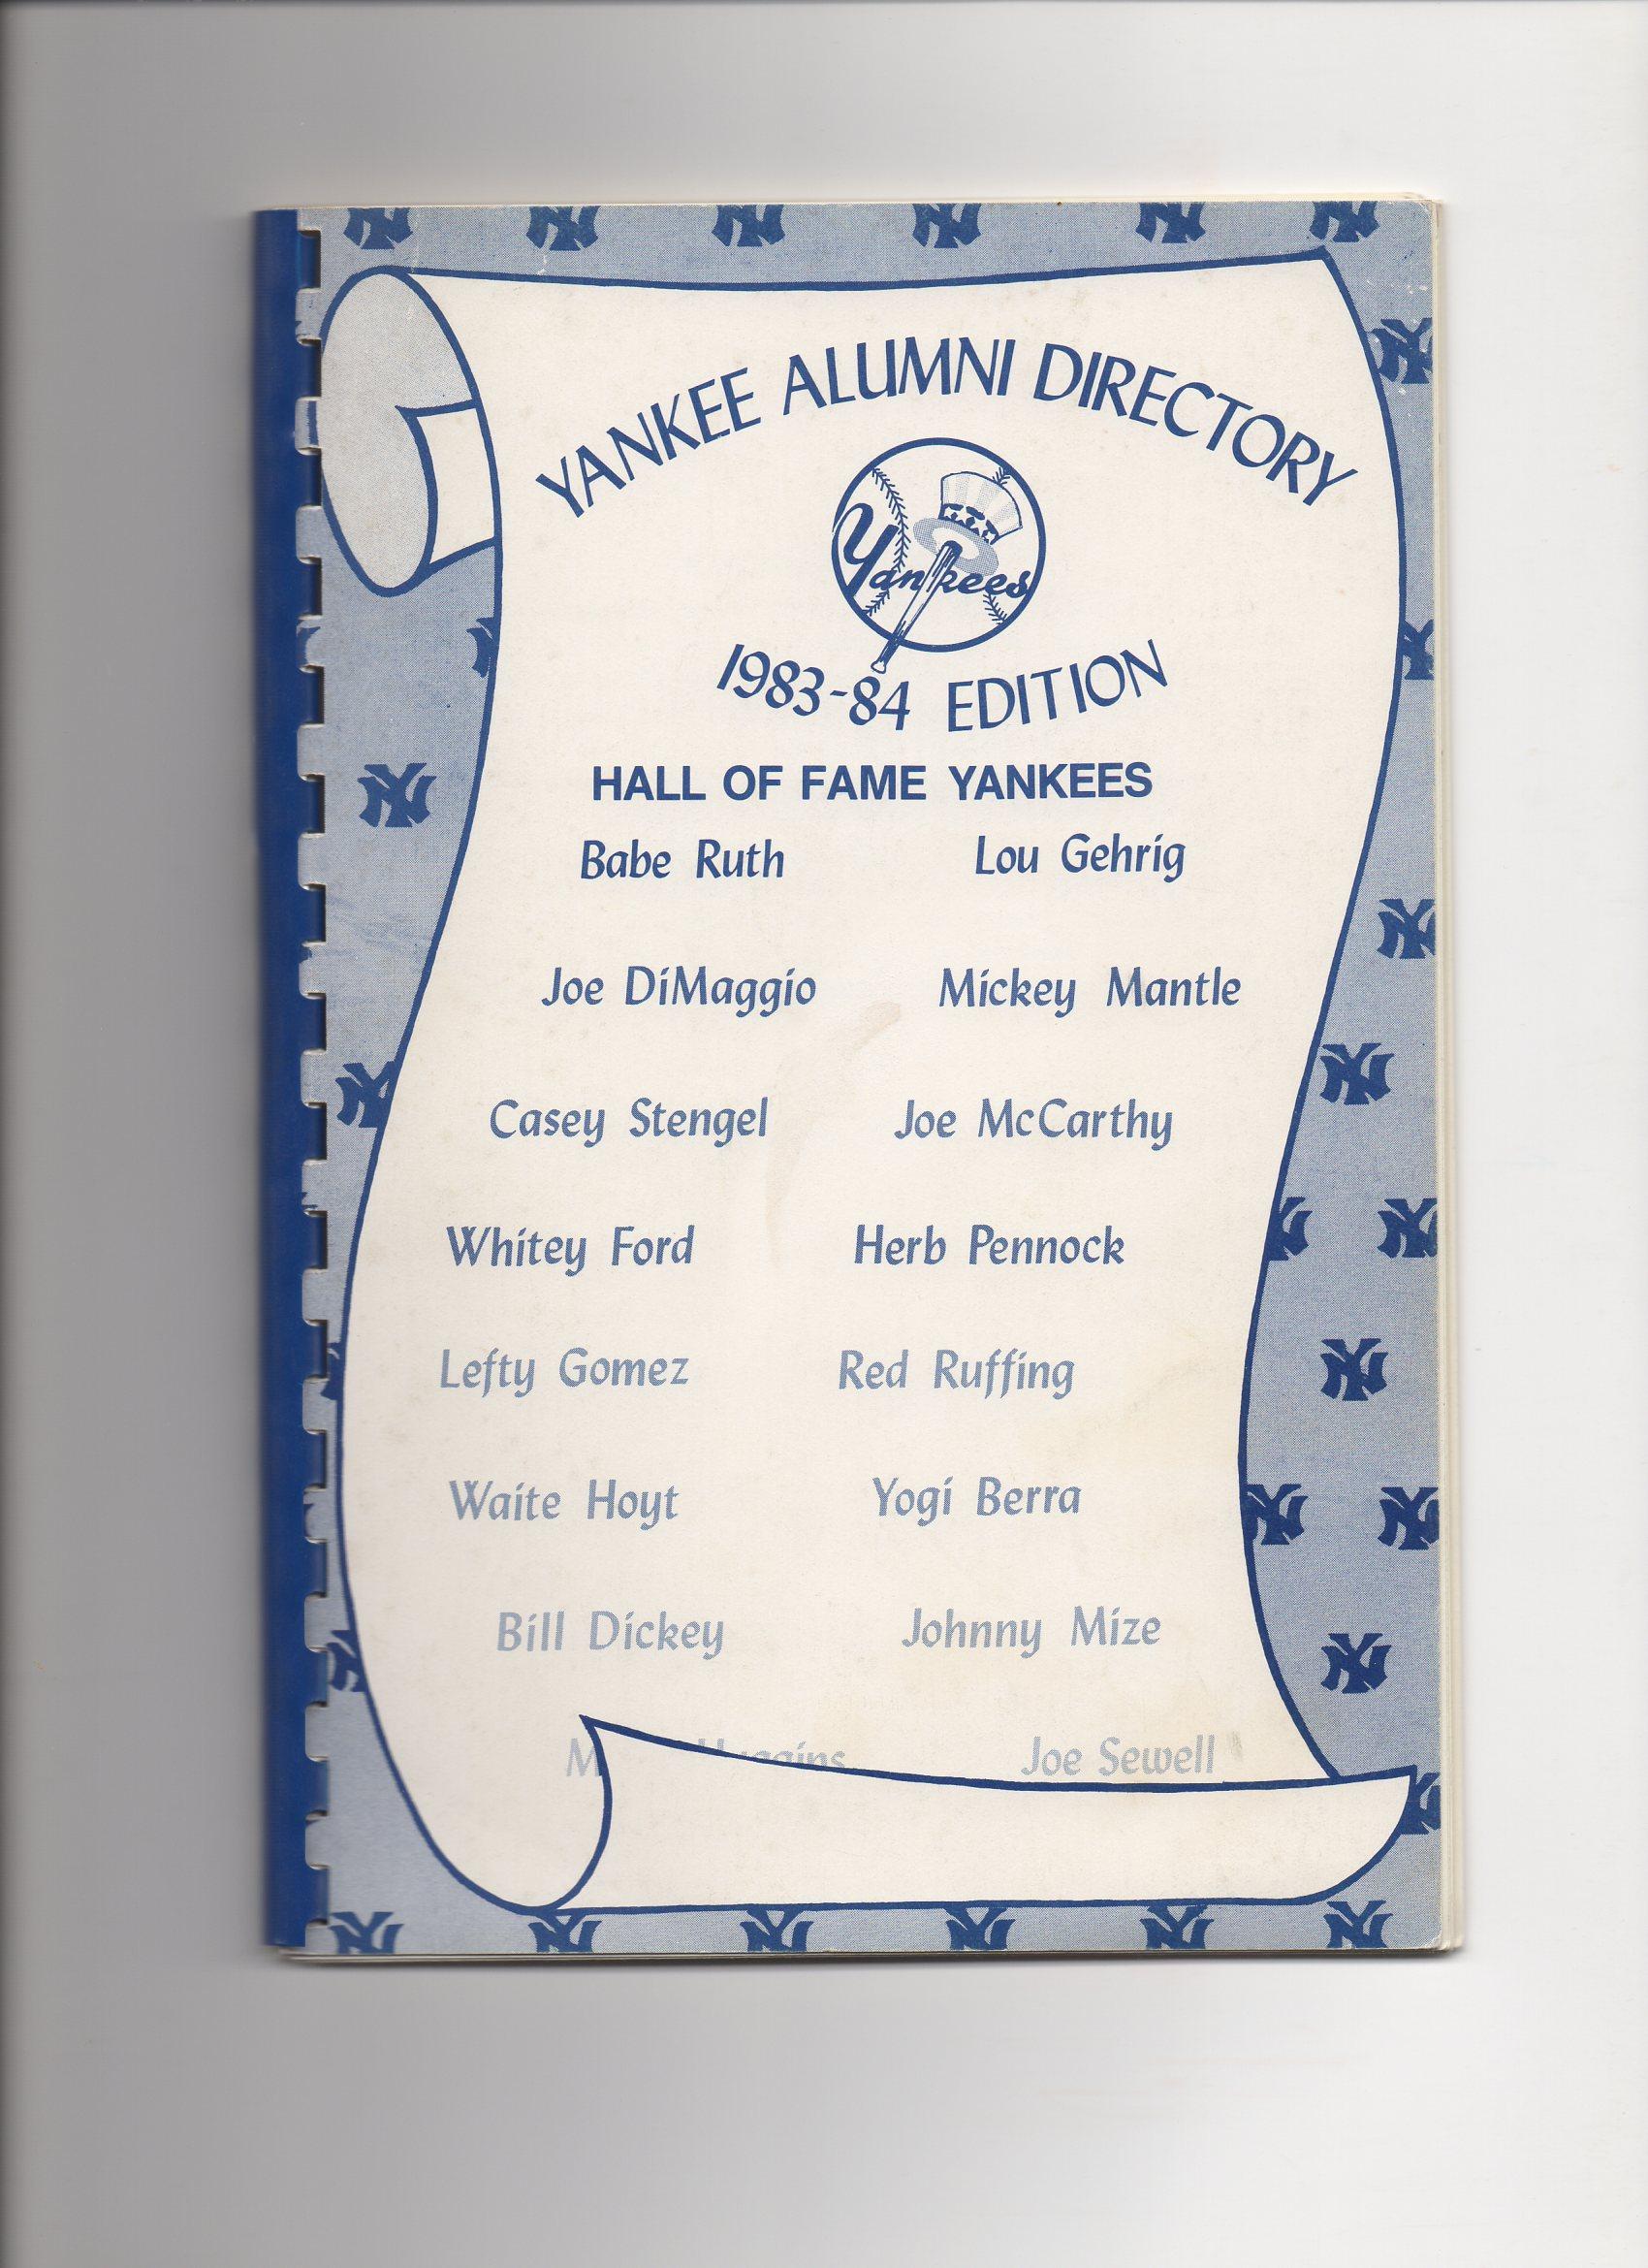 1983 to 1984 yankee alumni directory